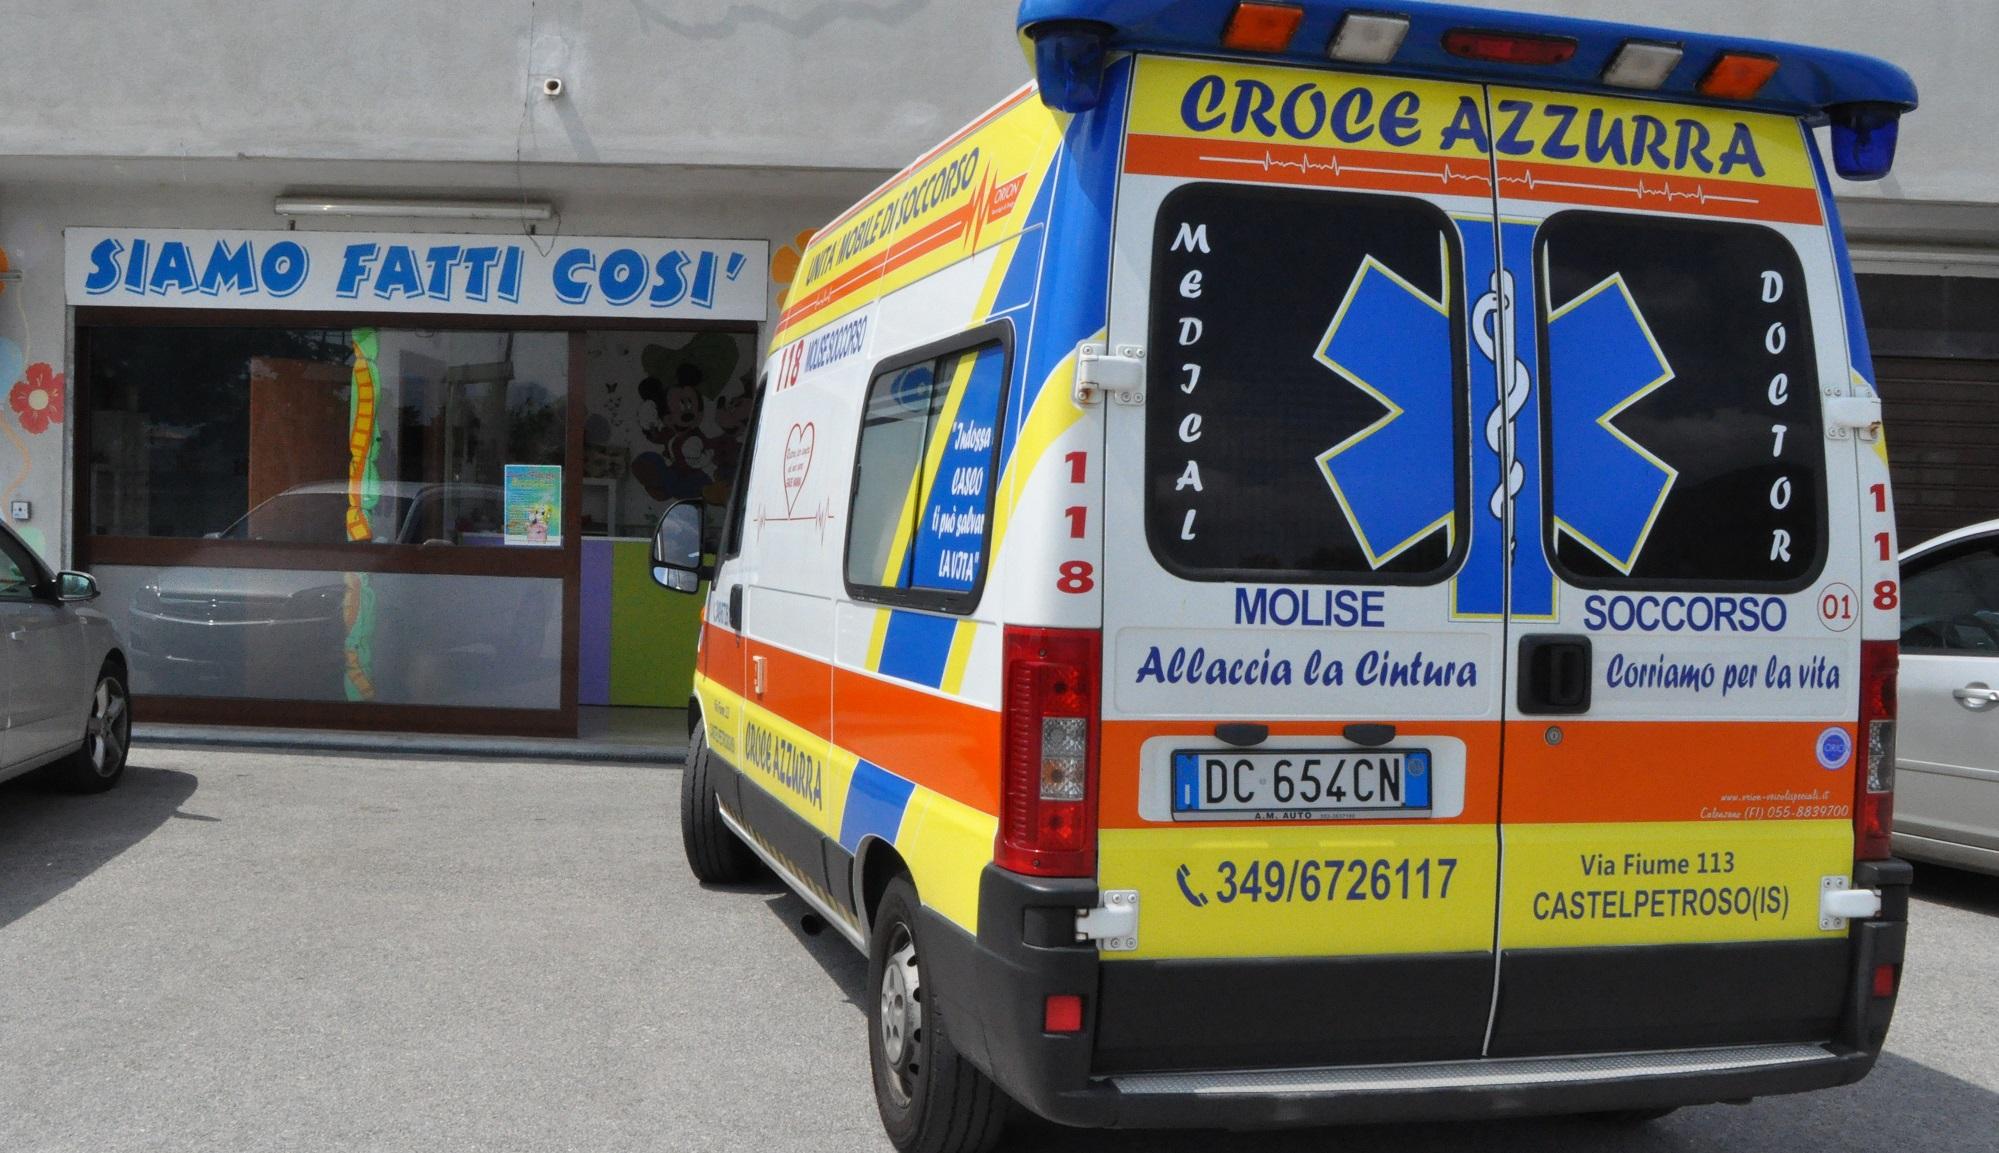 ambulanza croce azzurra ludoteca